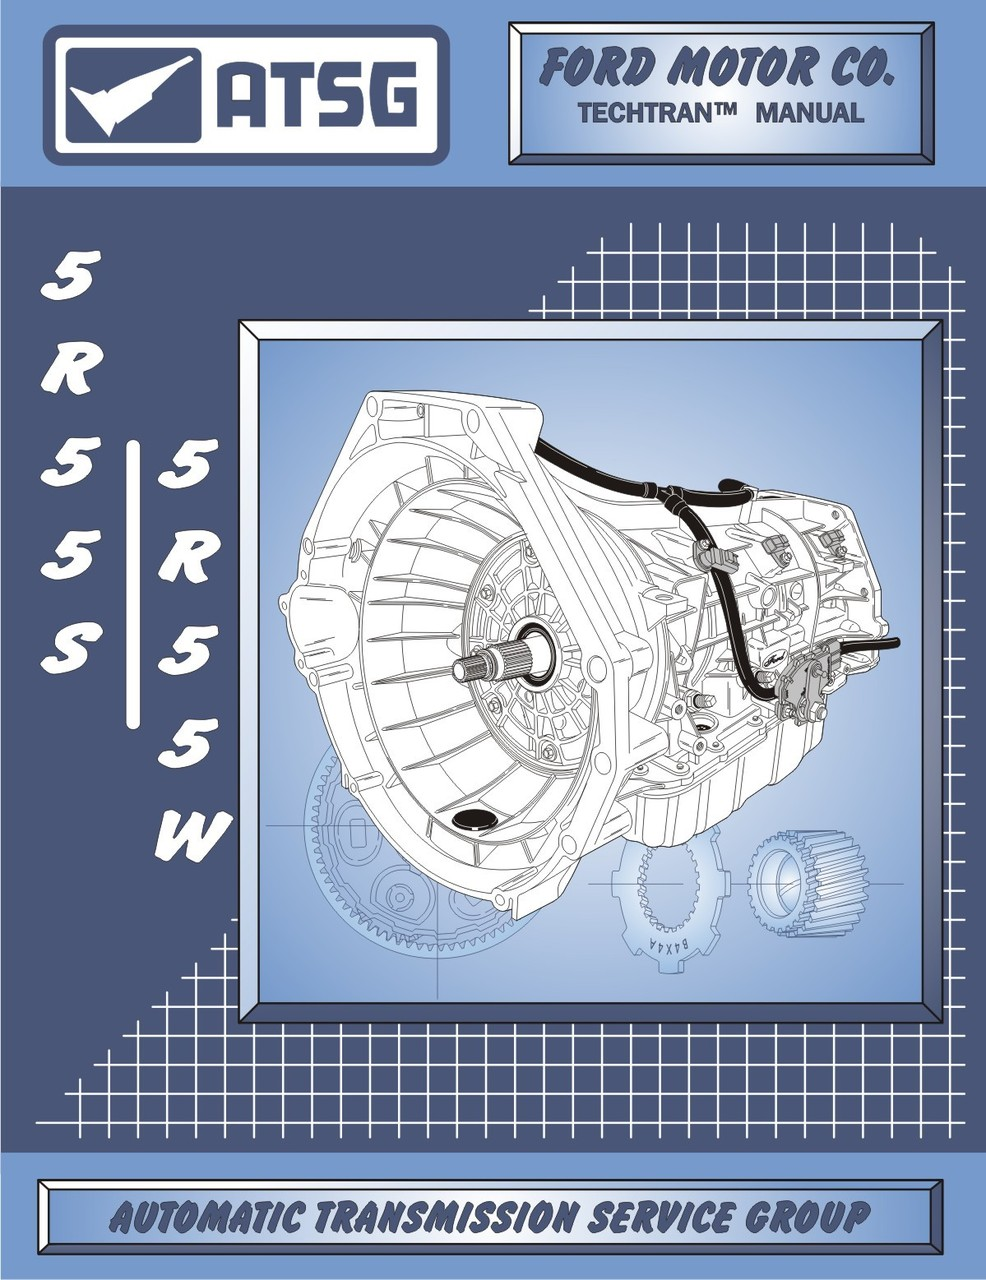 AUTOMATIC TRANSMISSION - 5R55N 5R55S 5R55W FORD LINCOLN JAGUAR